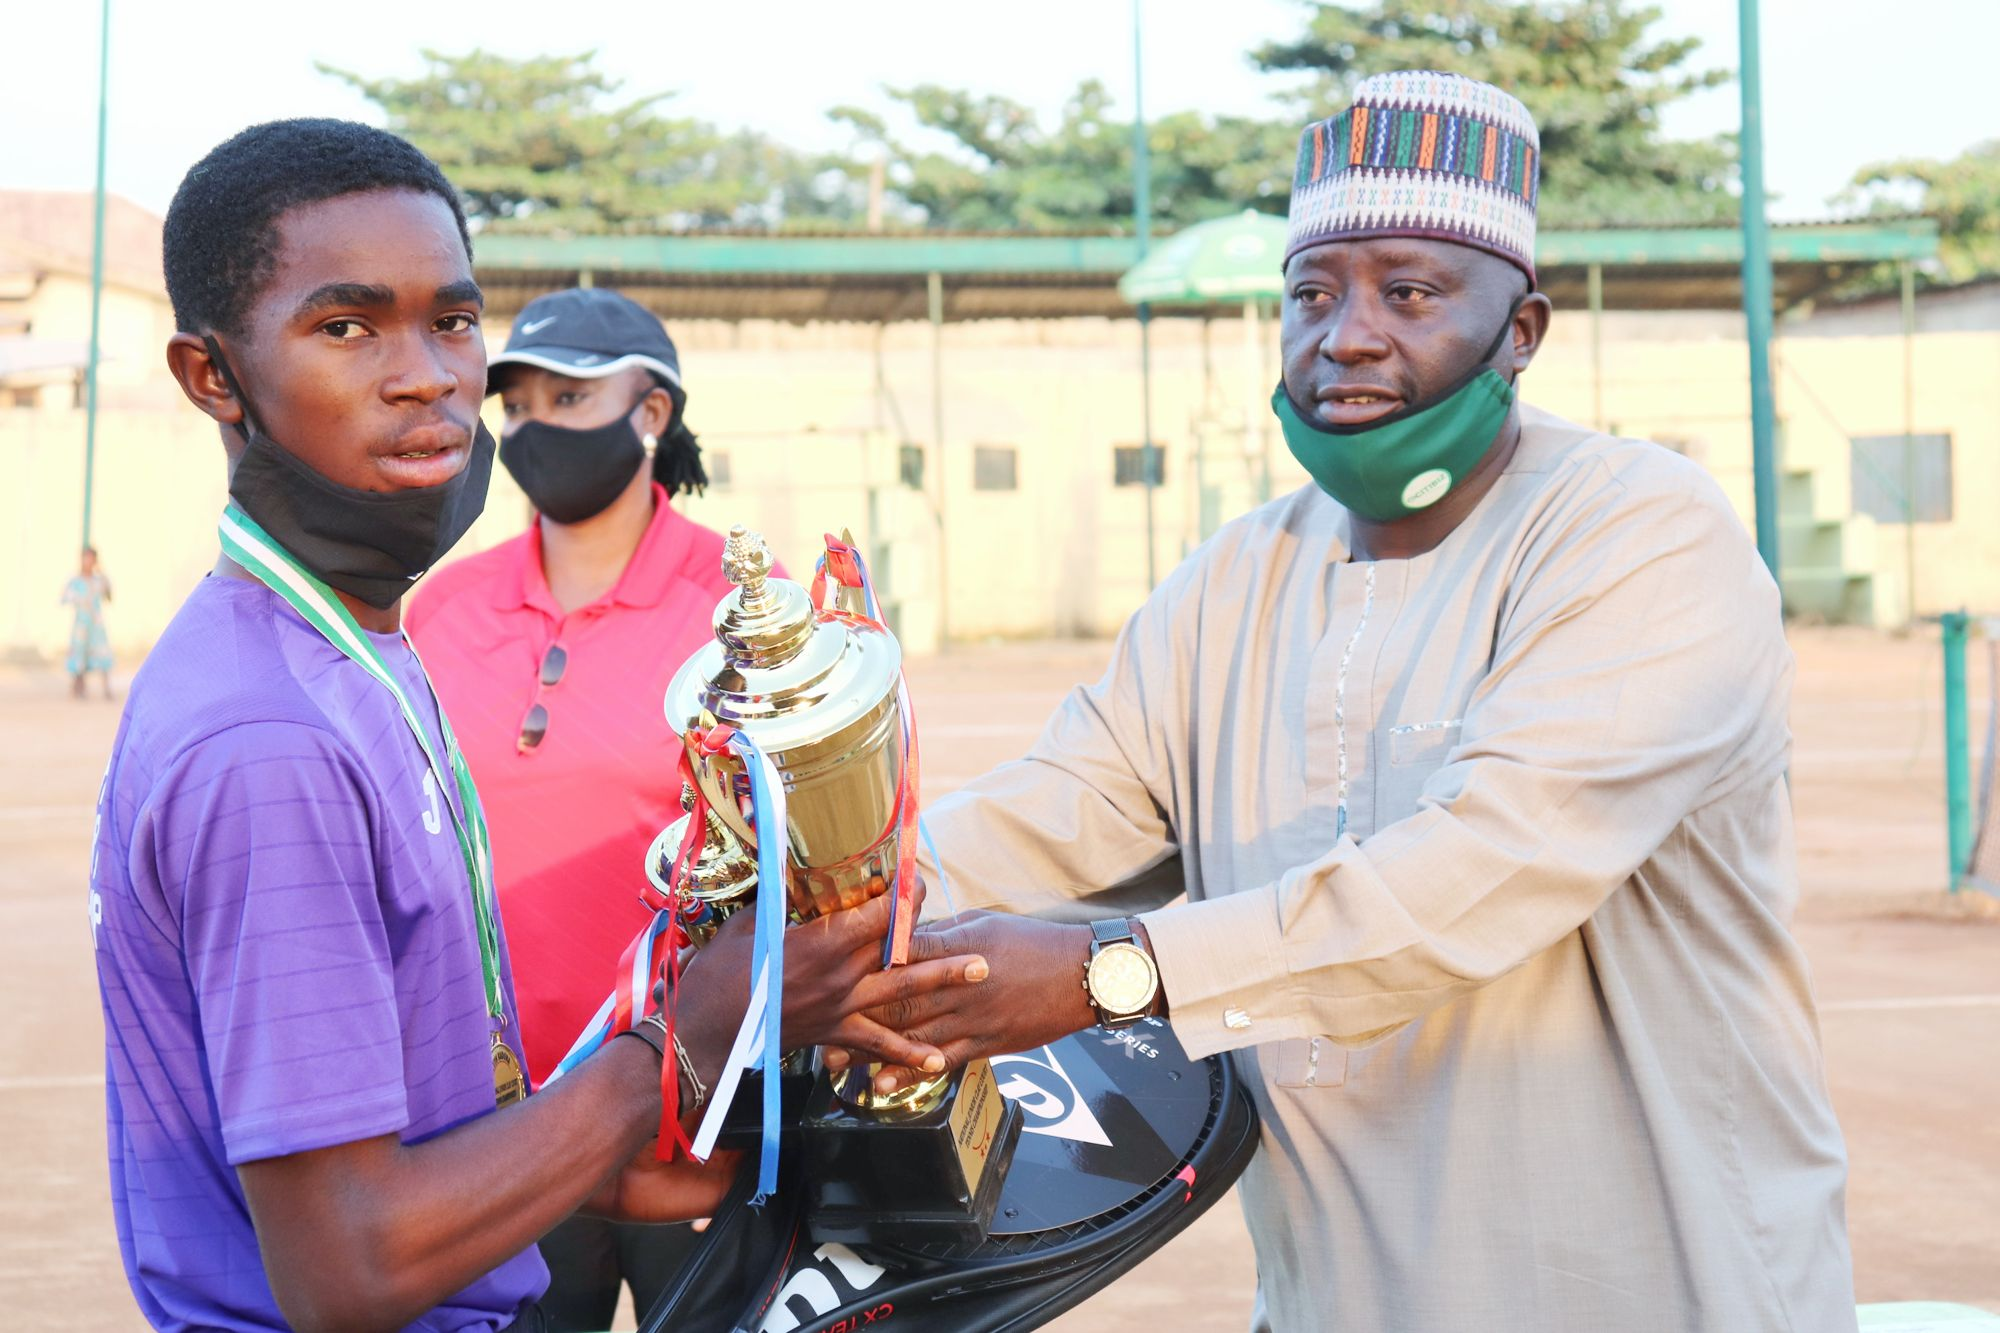 Canice AbuaMr Joel Adi